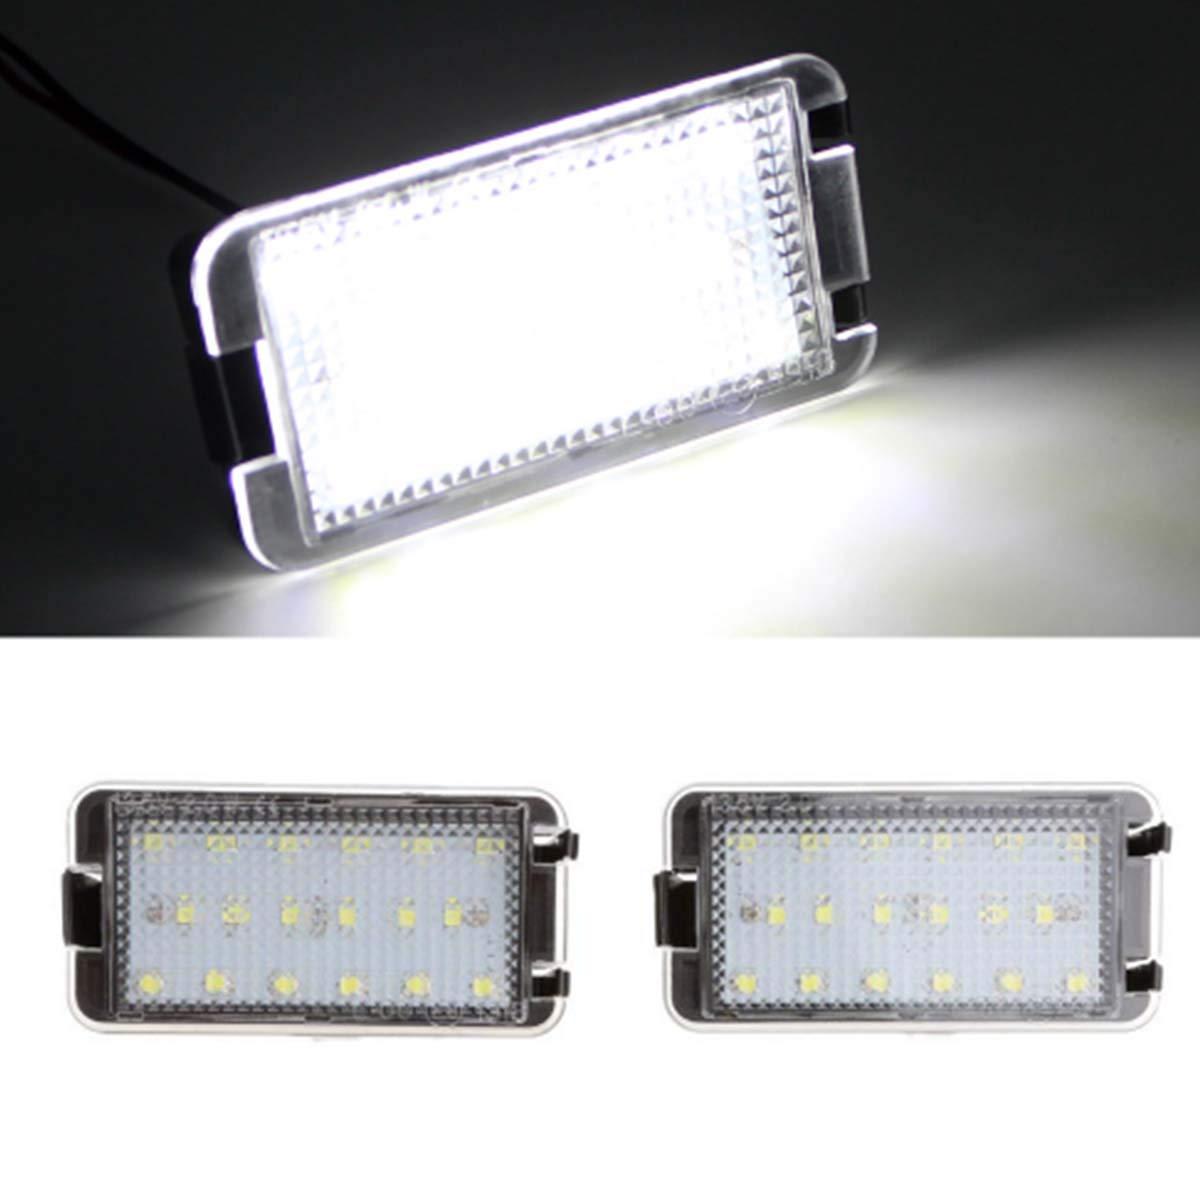 GOFORJUMP Luz de matrí cula LED Super Brillante 2X18SMD Canbus para 99-05 S/Eat Leon 1M 04-09 Altea Arosa Có rdoba MK1 MK2 Ibiza Toledo 5P